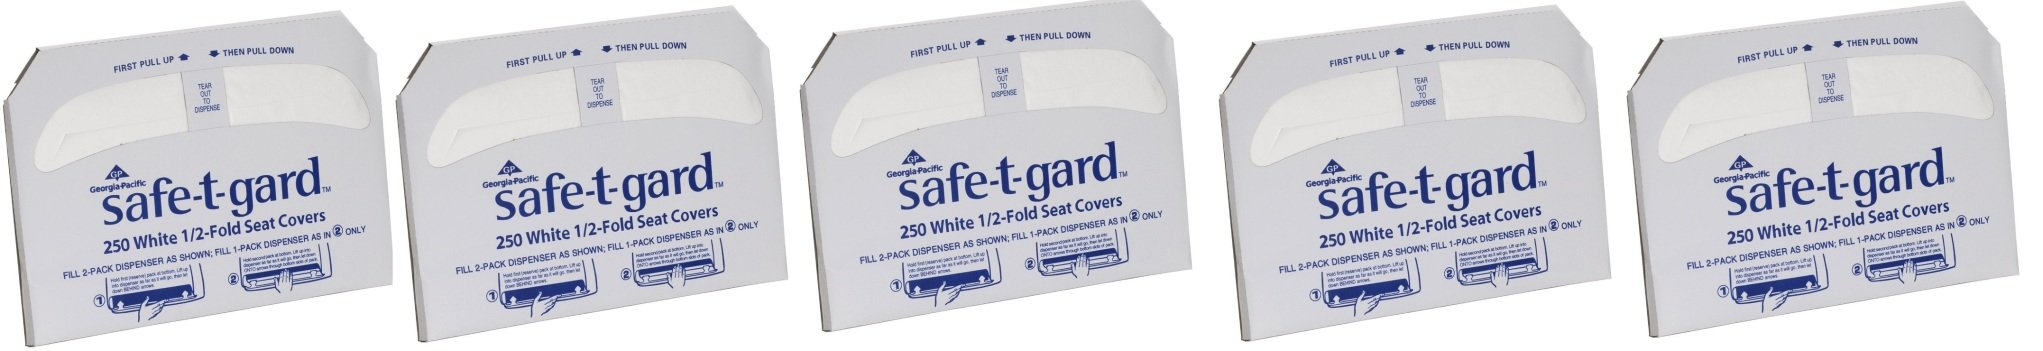 Georgia-Pacific Safe-T-Gard 47052 1/2-Fold Toilet Seat Cover, 17.44'' L X 14.5'' W - White mkXHdU, 5 Pack (250 per Pack)